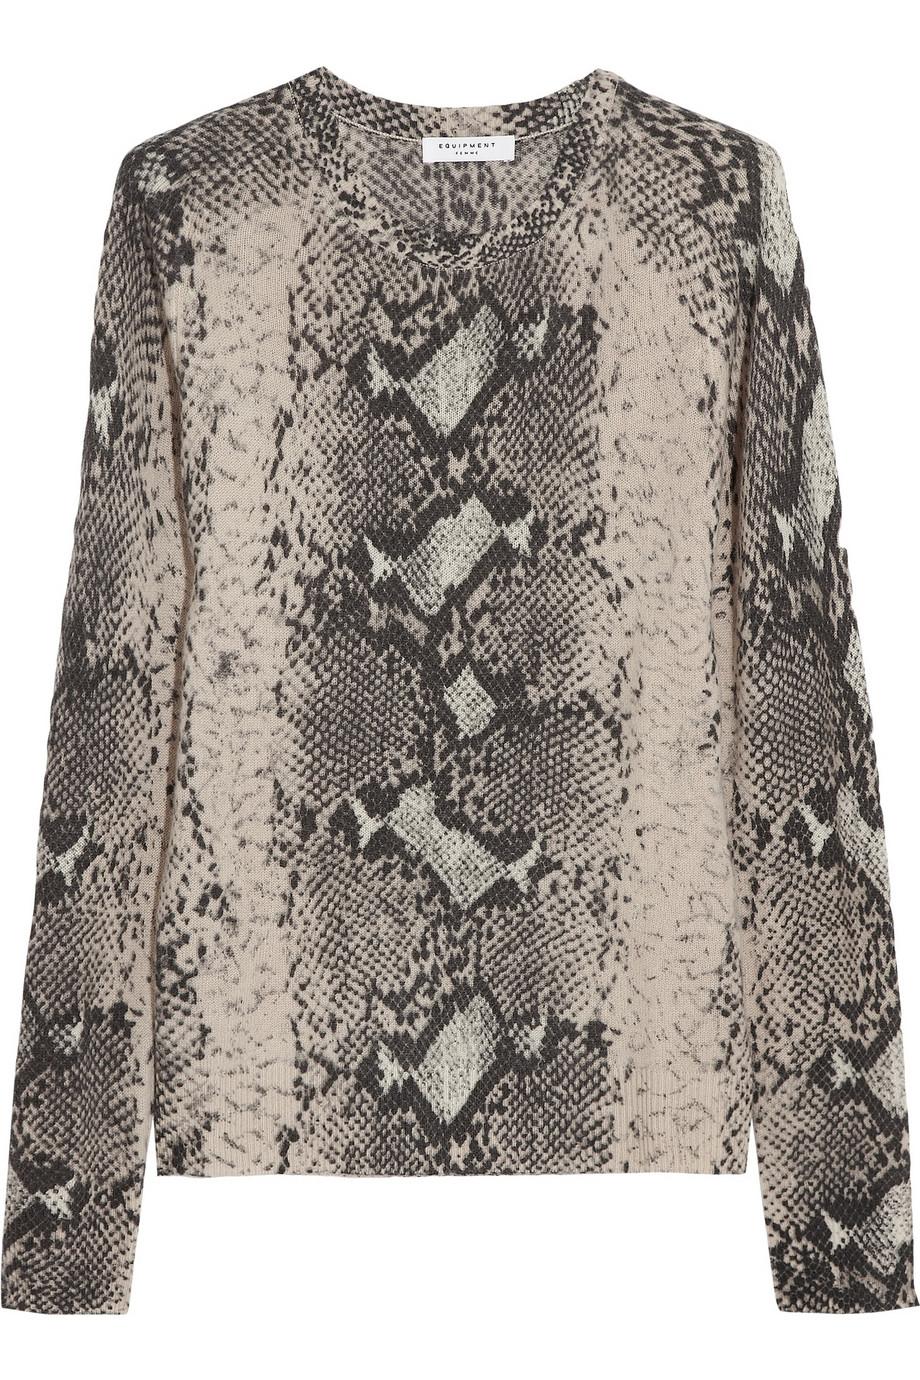 Equipment Sloane Snakeprint Fineknit Cashmere Sweater | Lyst